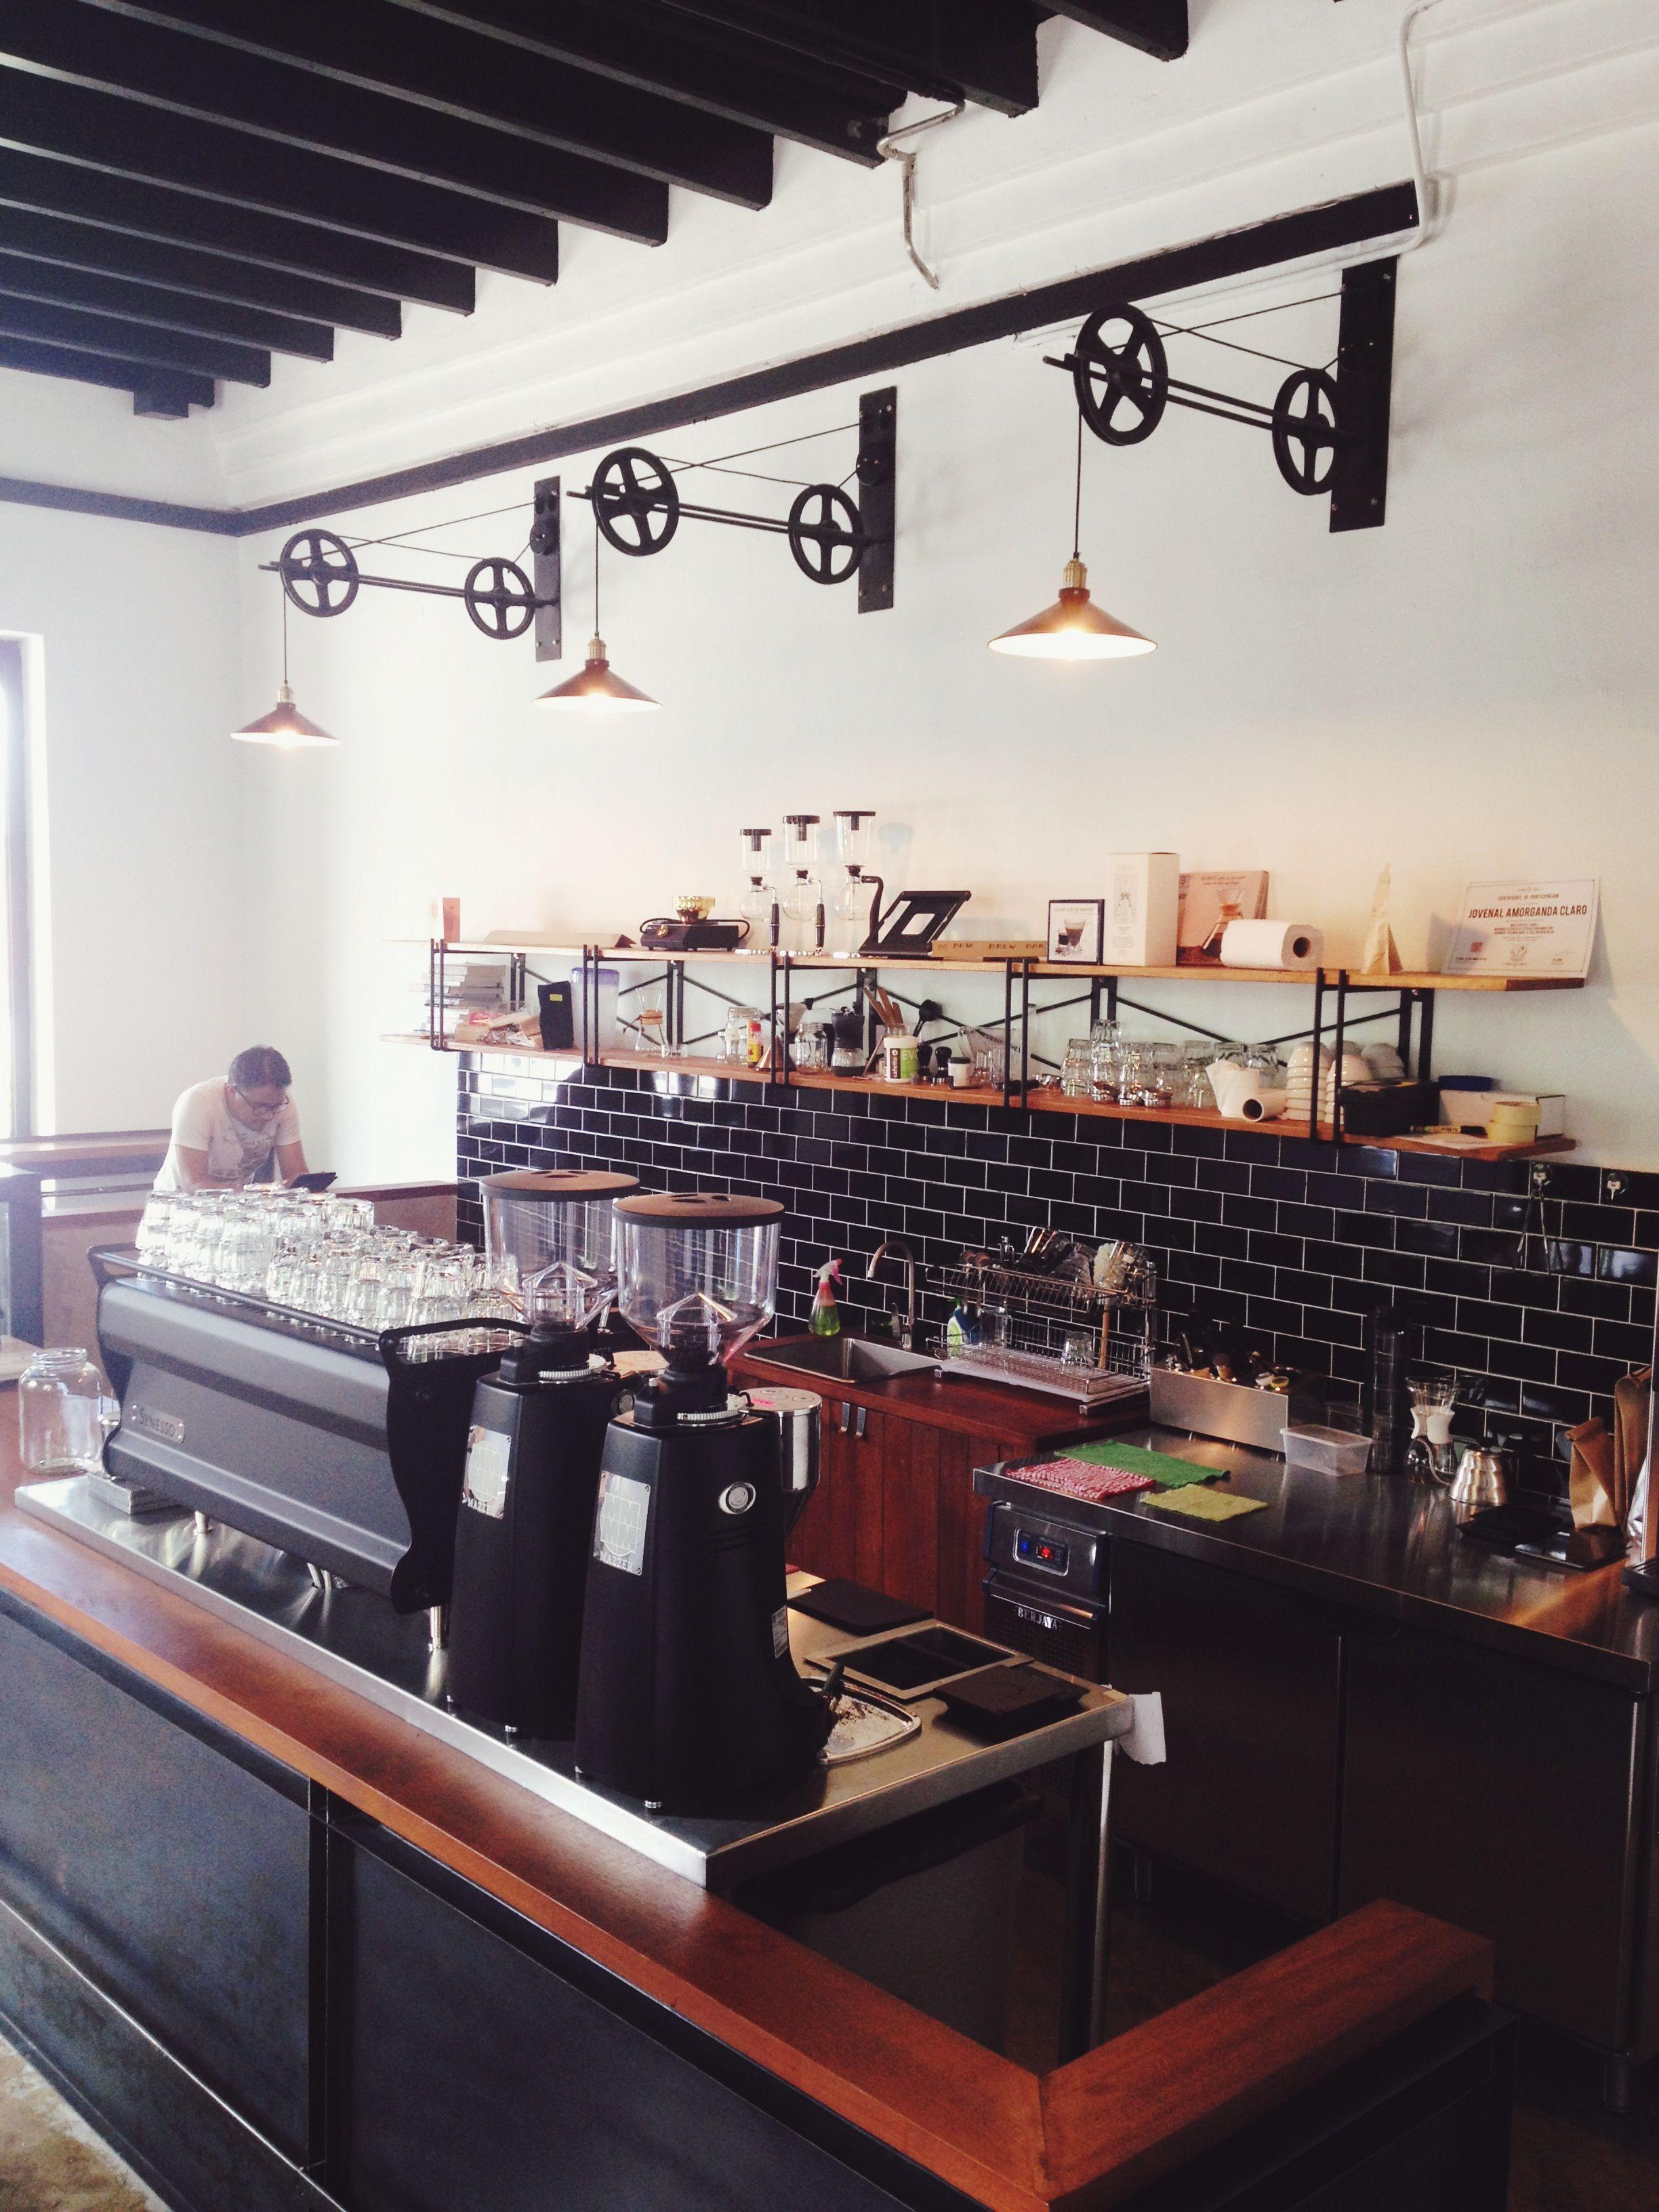 vcr cafe jalan galloway, kuala lumpurkarya #cafe#coffee